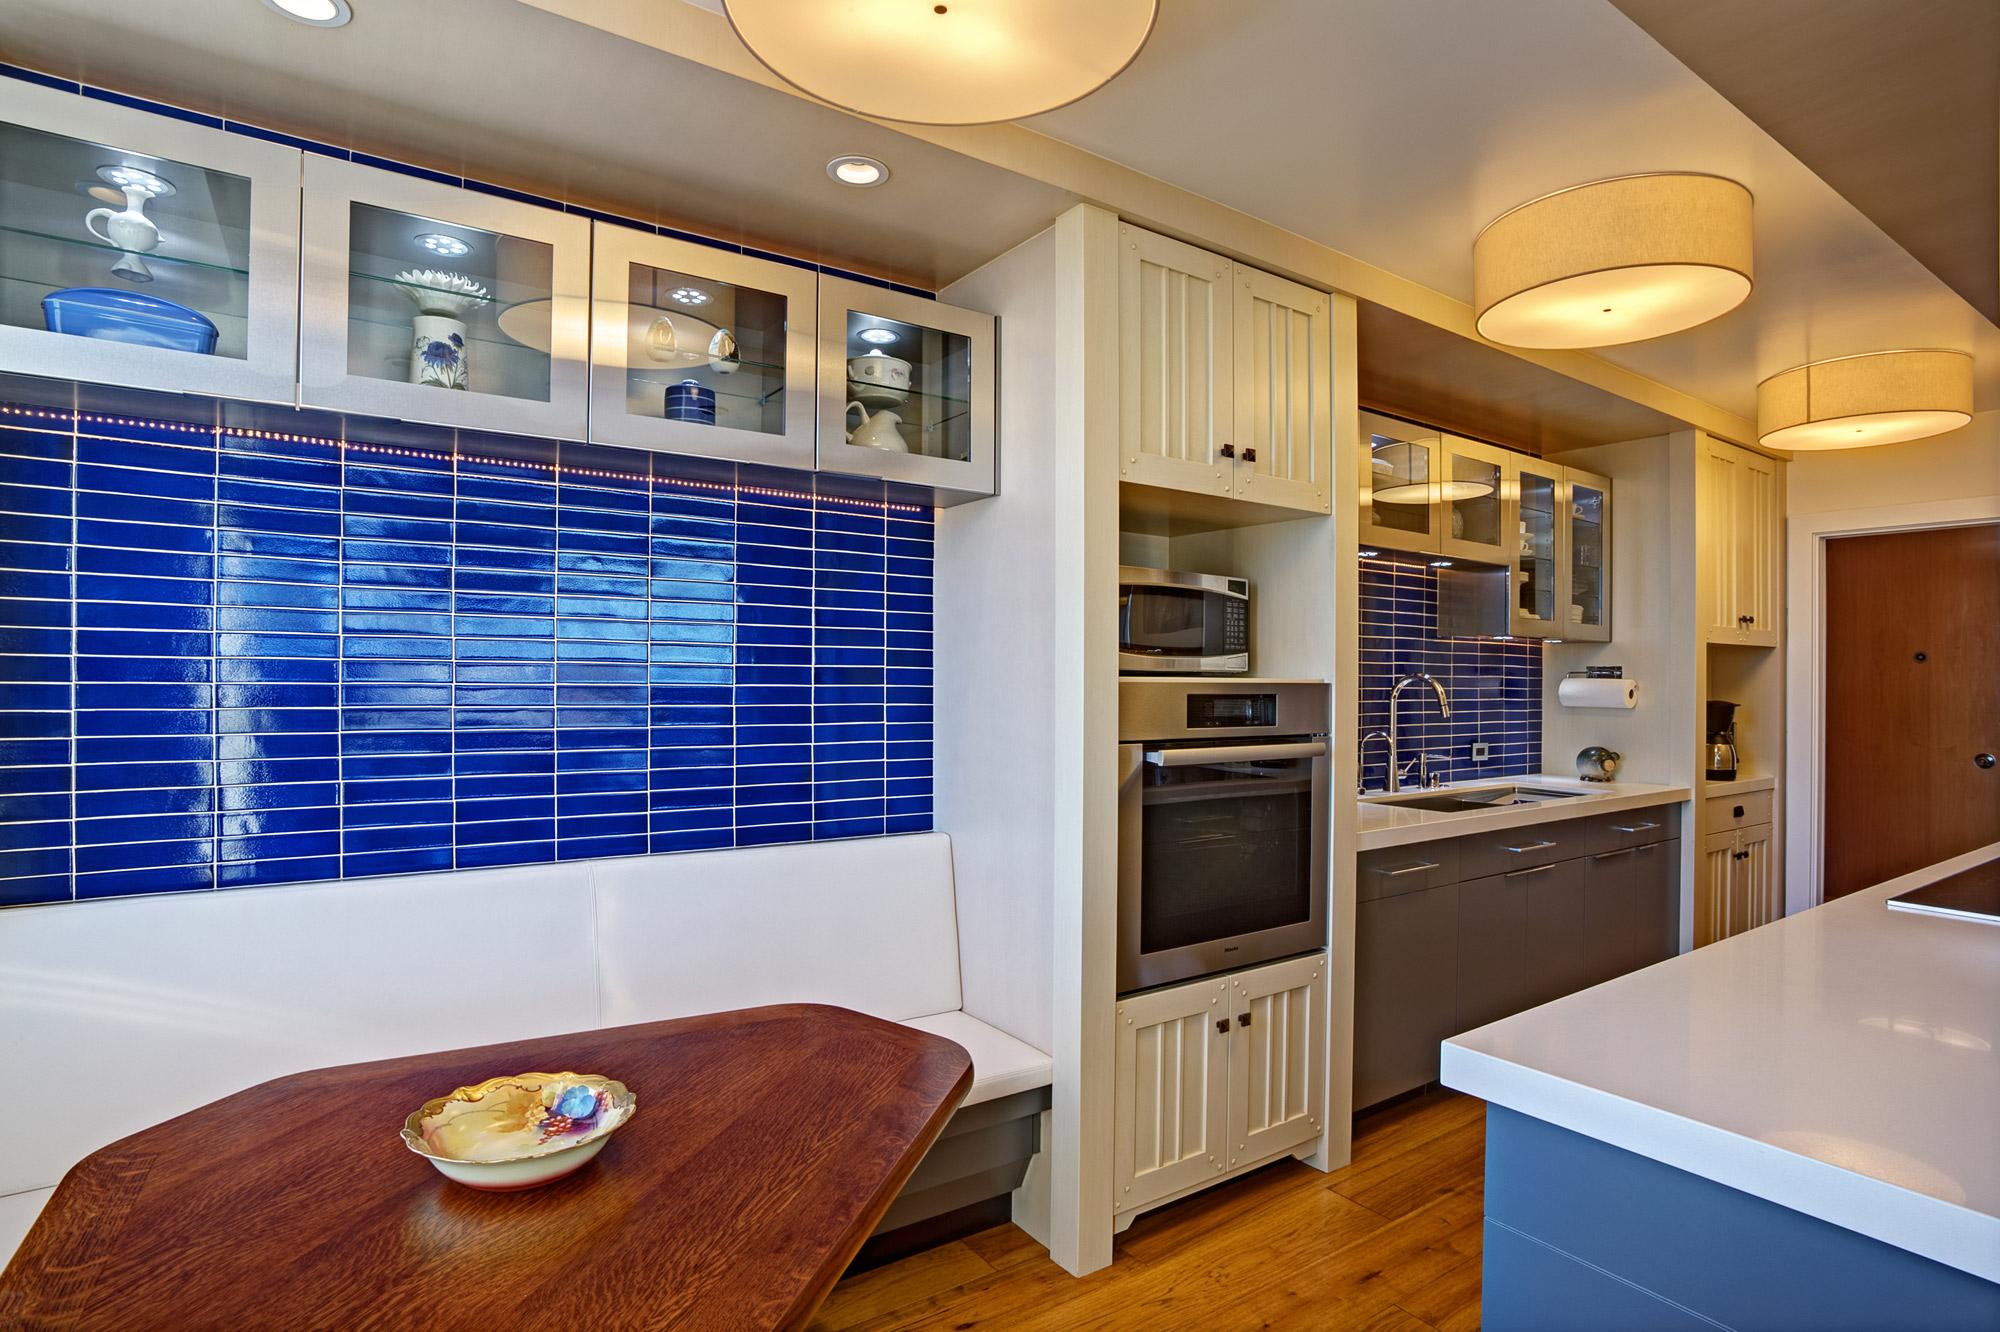 Kaplan-Architects-high-rise-interior-remodeled-kitchen-built-in-bench.jpg